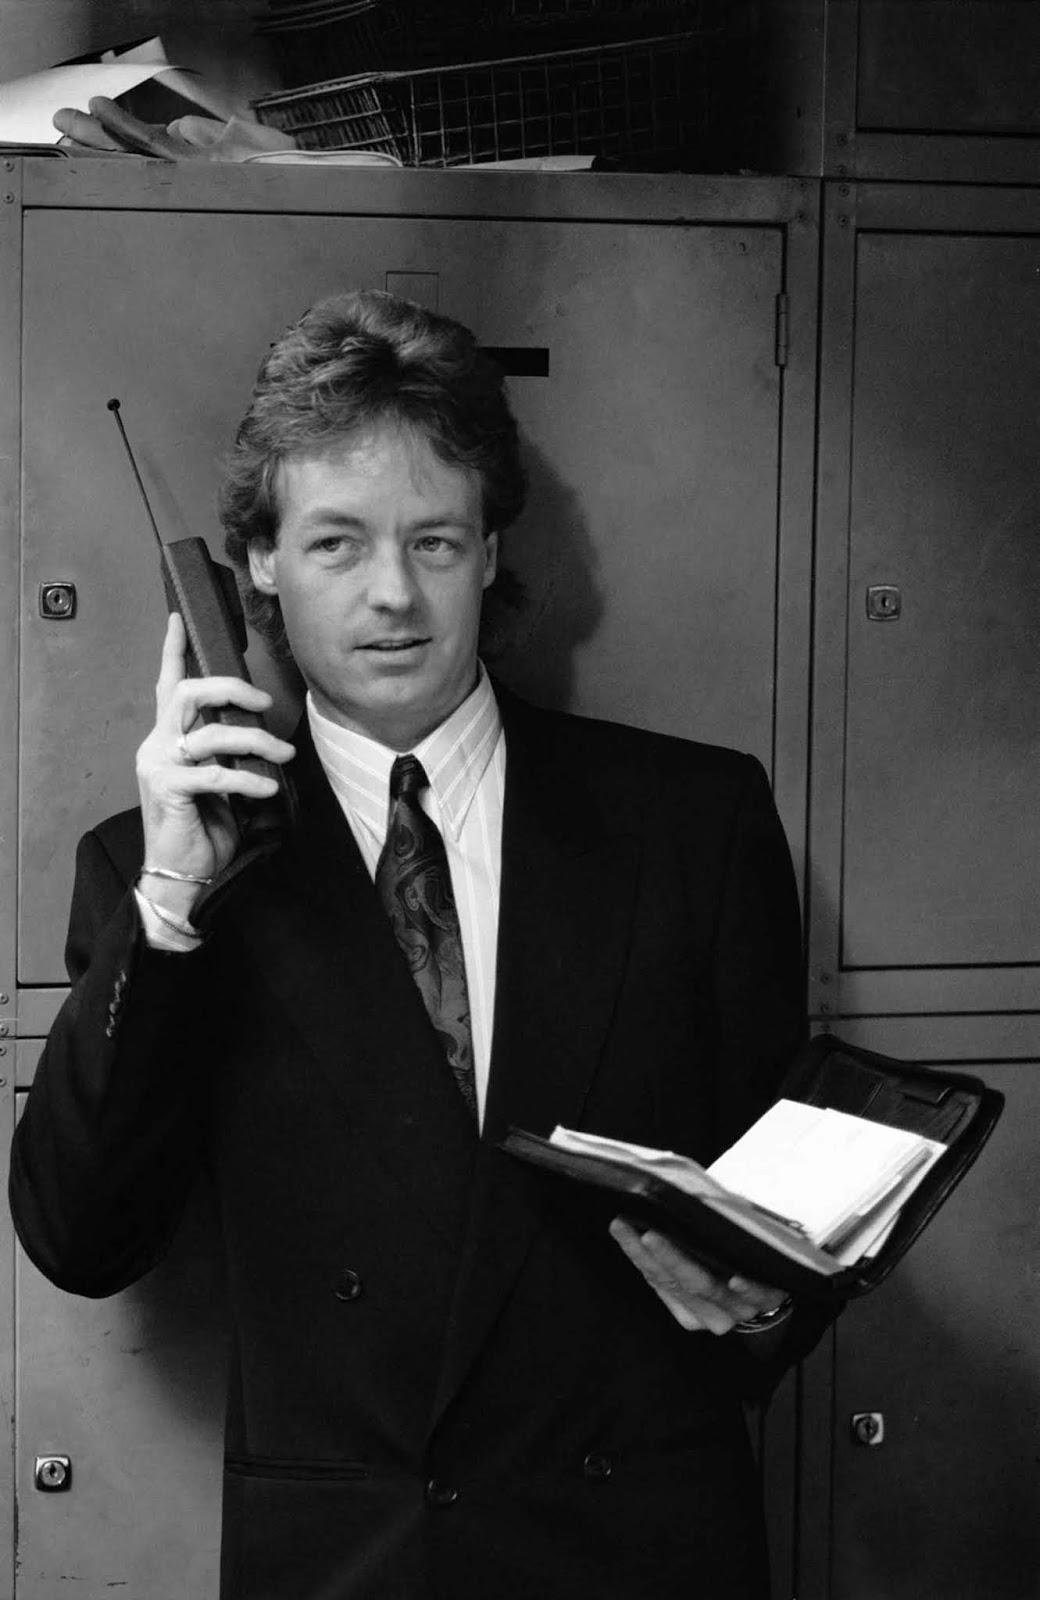 An archetypal '80s man. 1988.